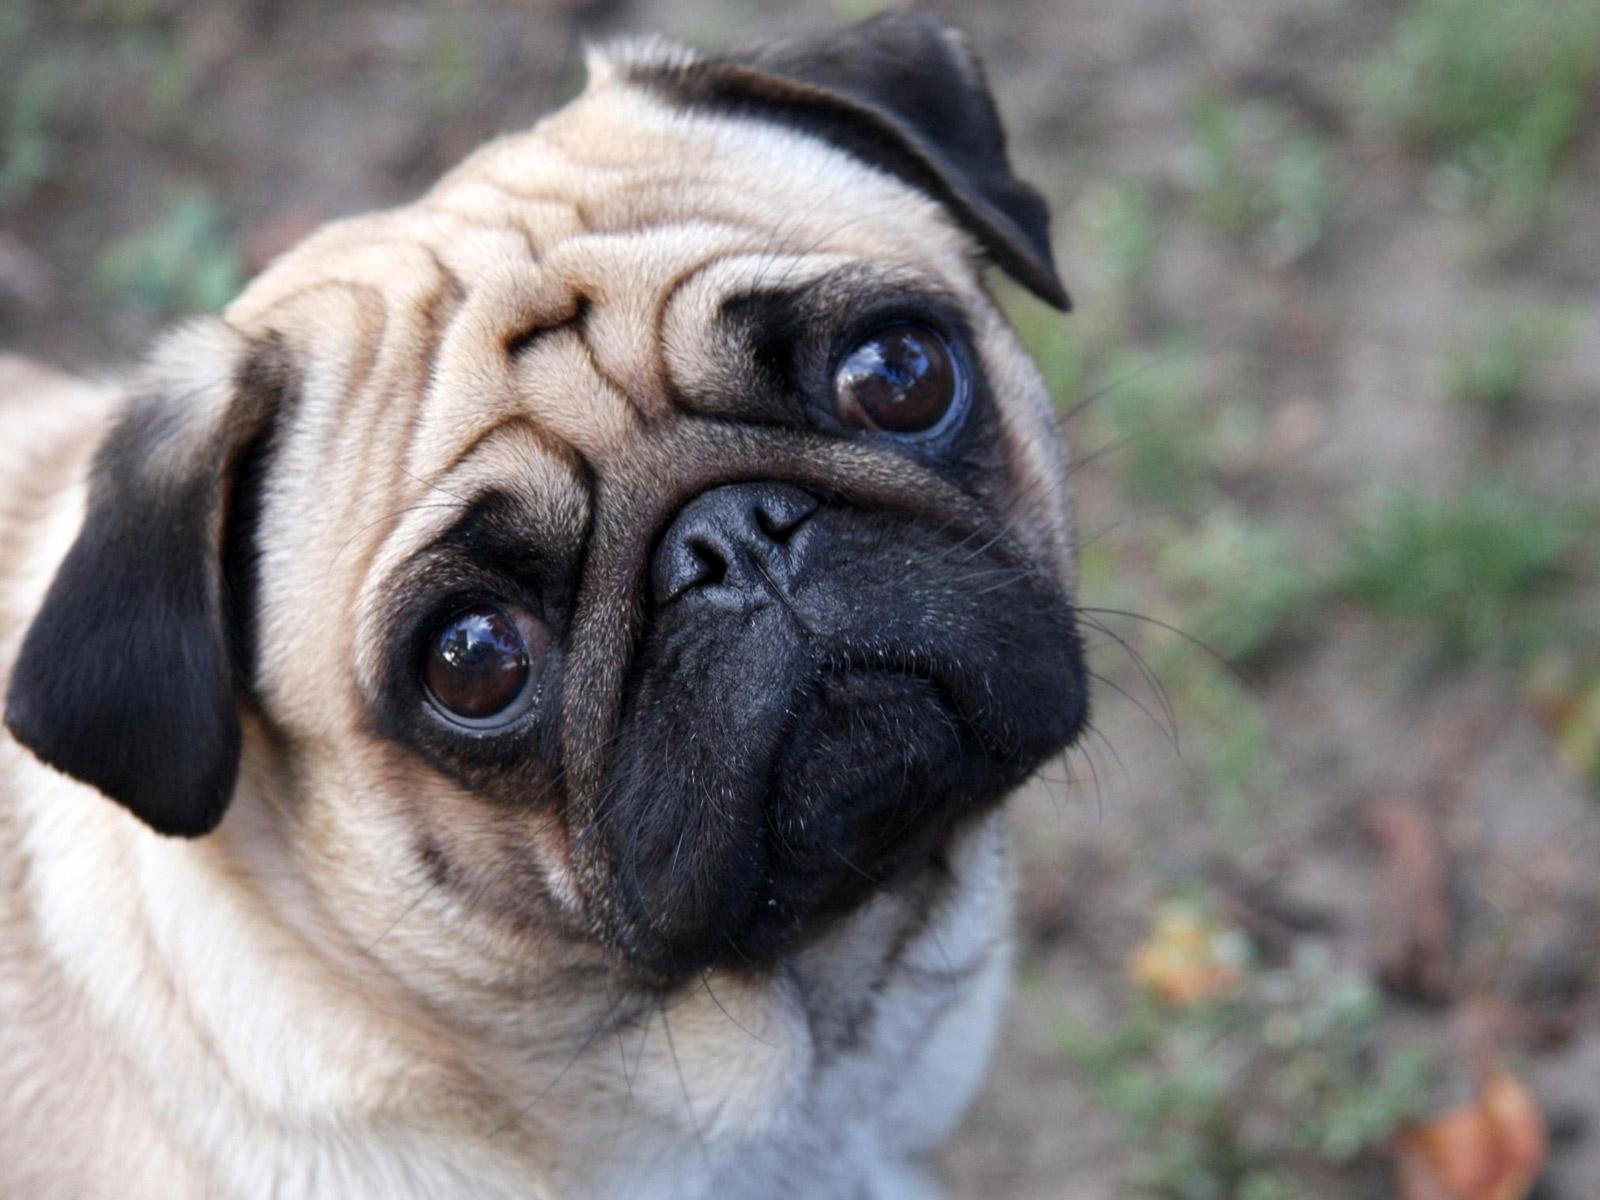 Cute Pug wallpapers Cute Pug stock photos 1600x1200